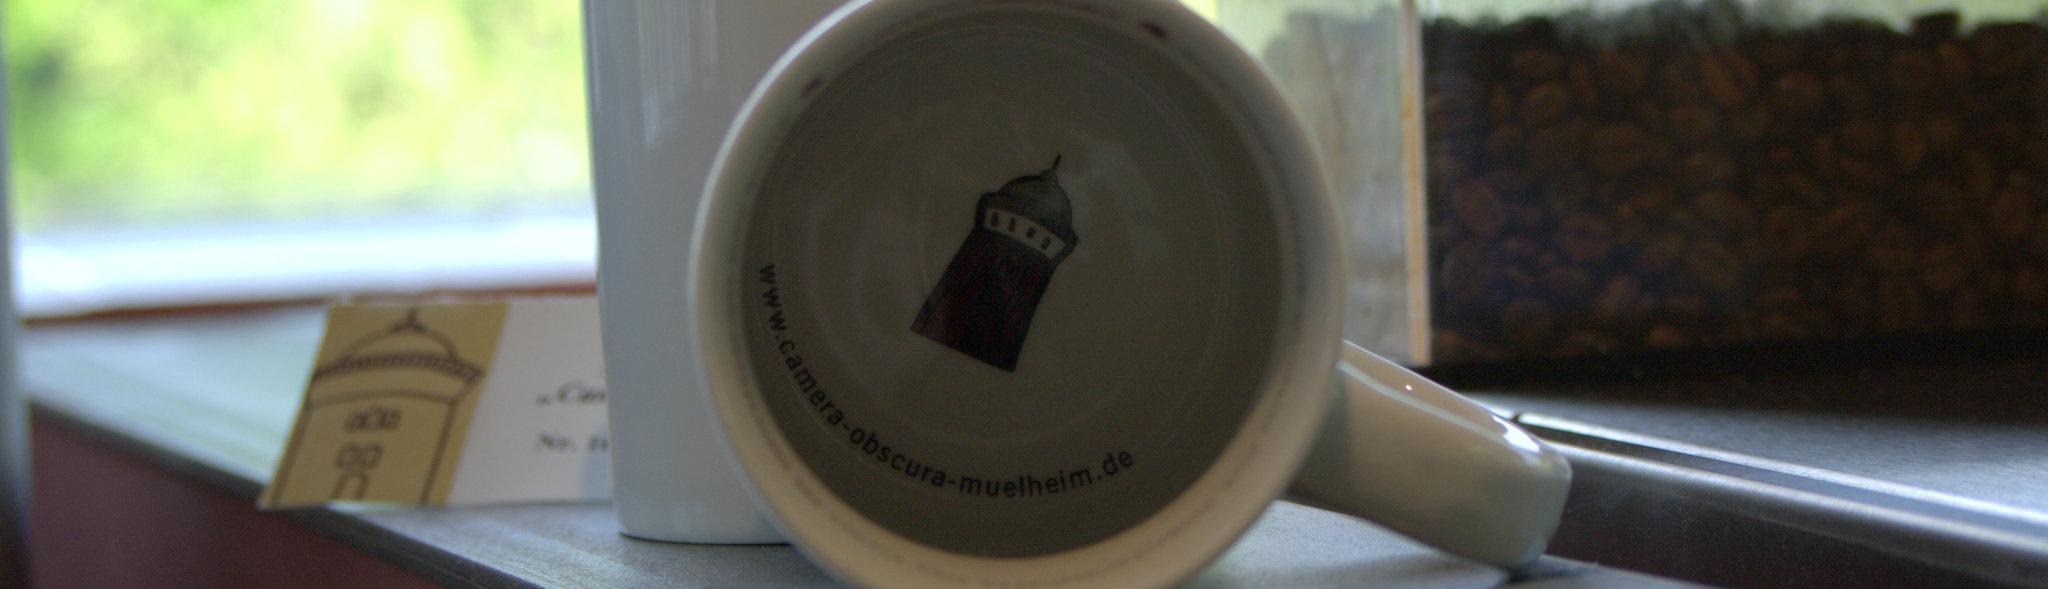 Camera Obscura – Mülheimer Rundumblick mit Carl Zeiss